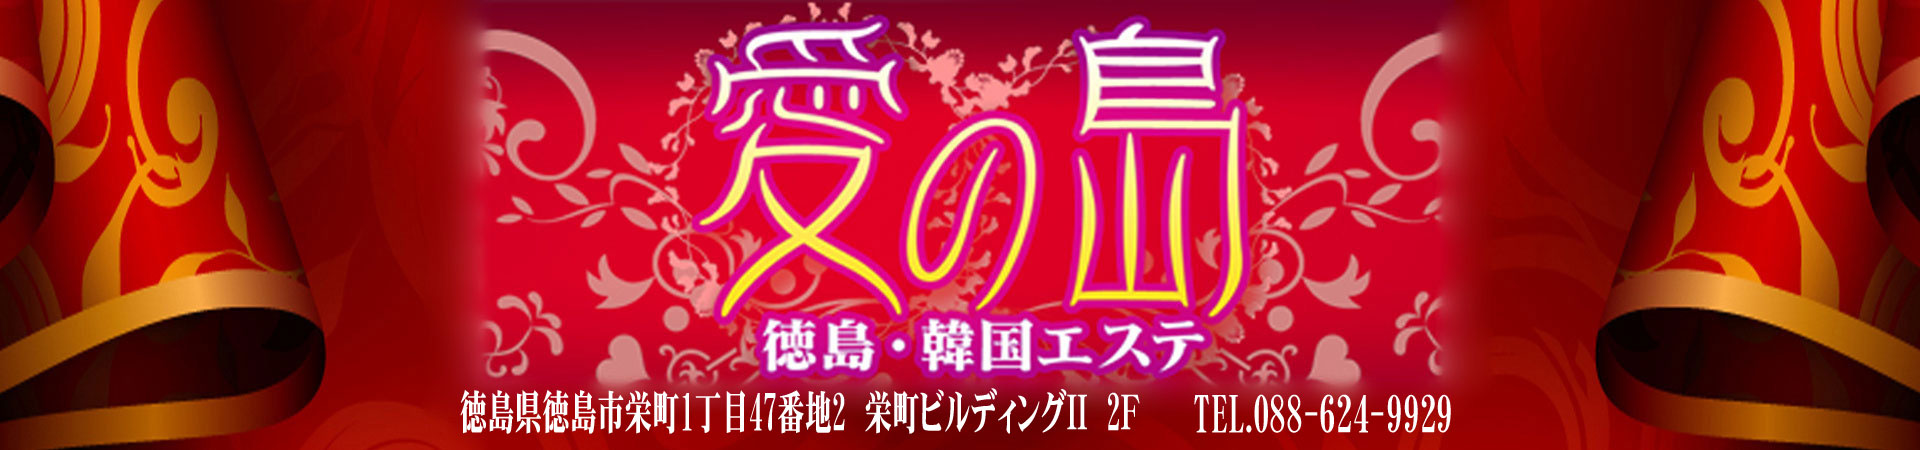 非公開: 【愛の島】徳島市